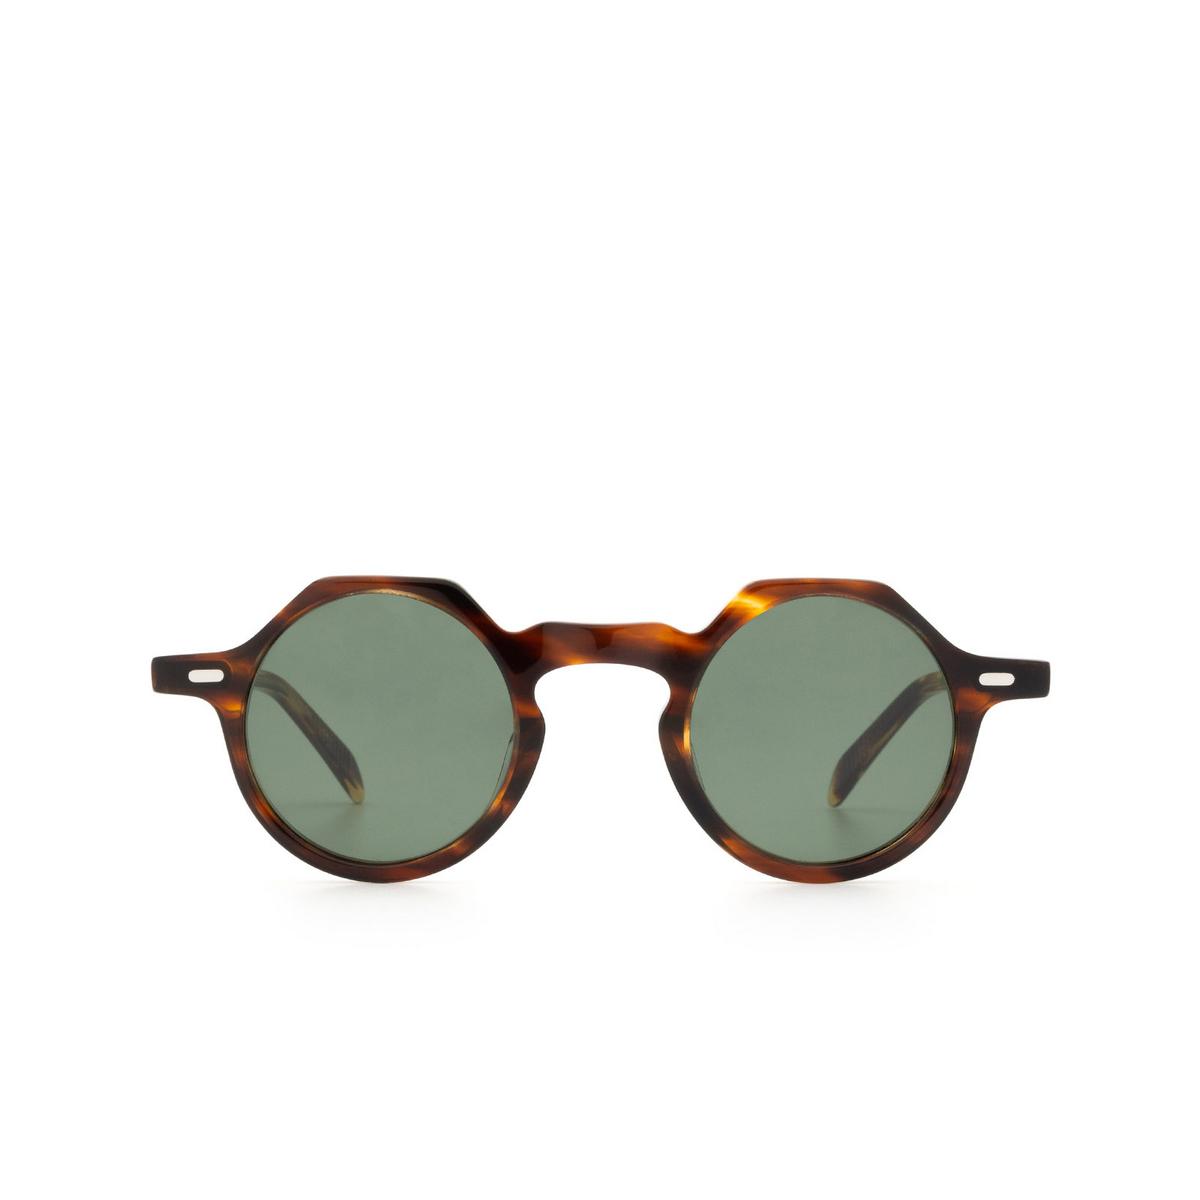 Lesca® Irregular Sunglasses: Yoga Sun color Havana 193 - front view.